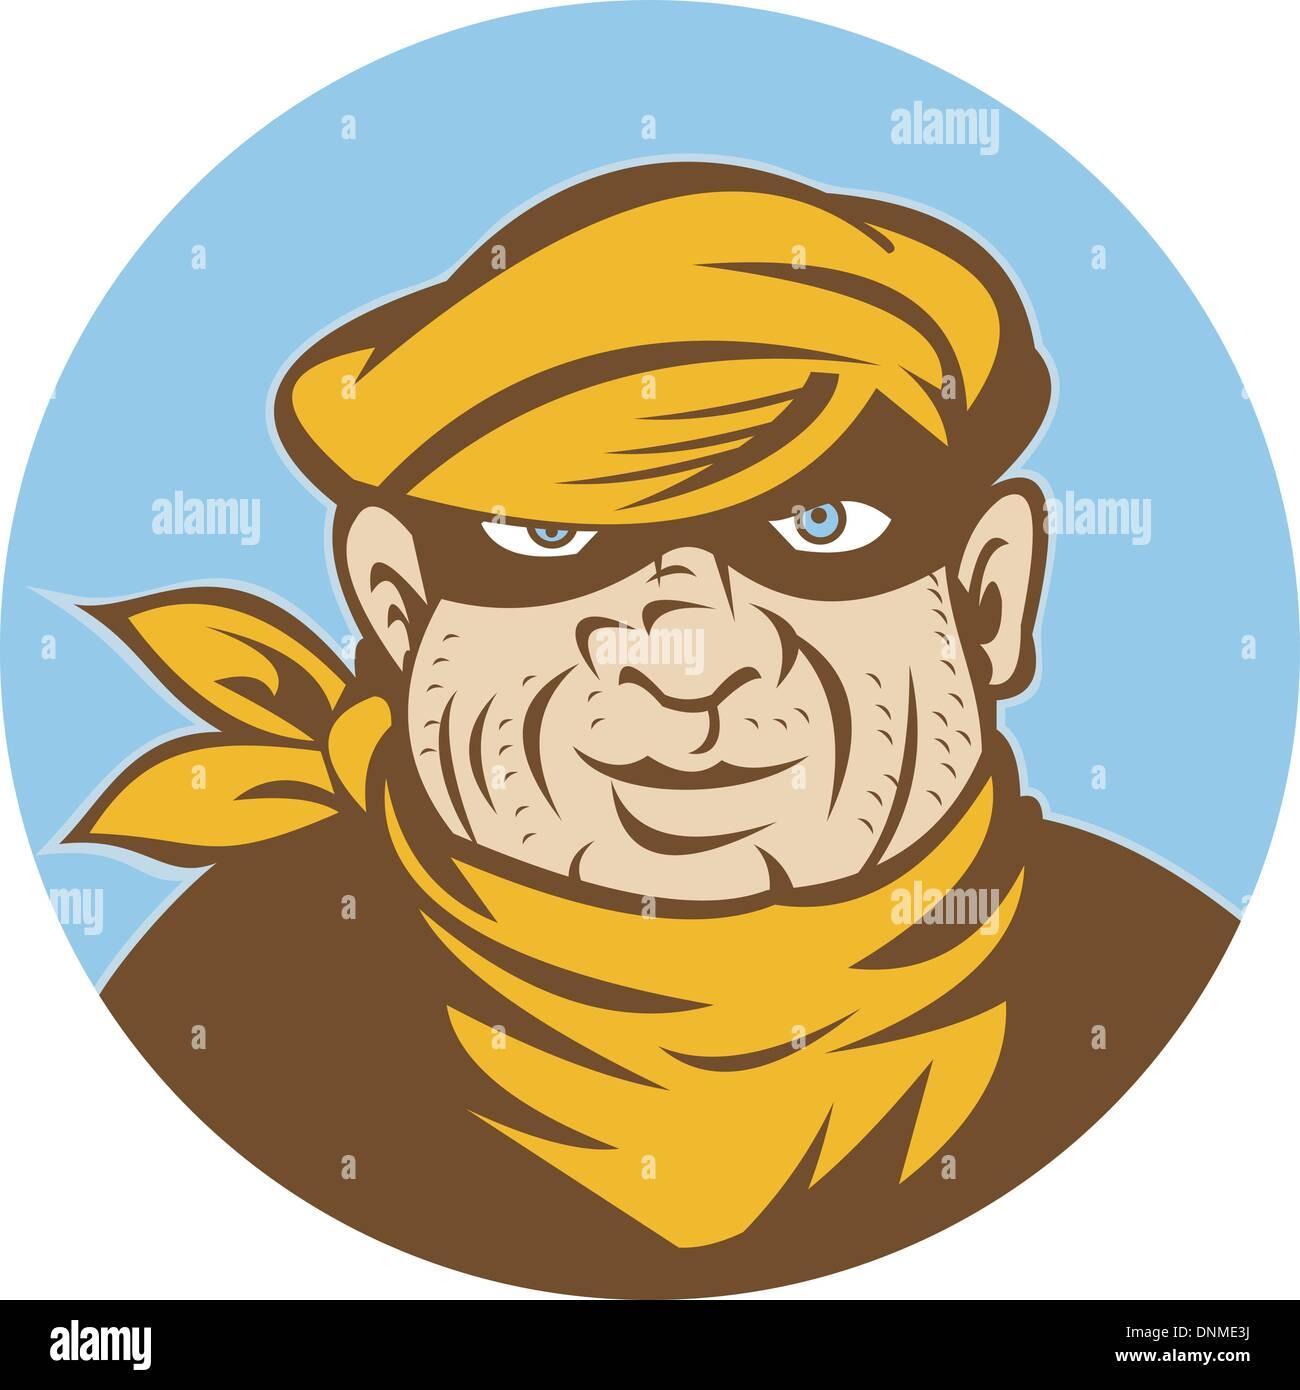 illustration of a Burglar thief or mugger looking at you set inside a circle - Stock Vector